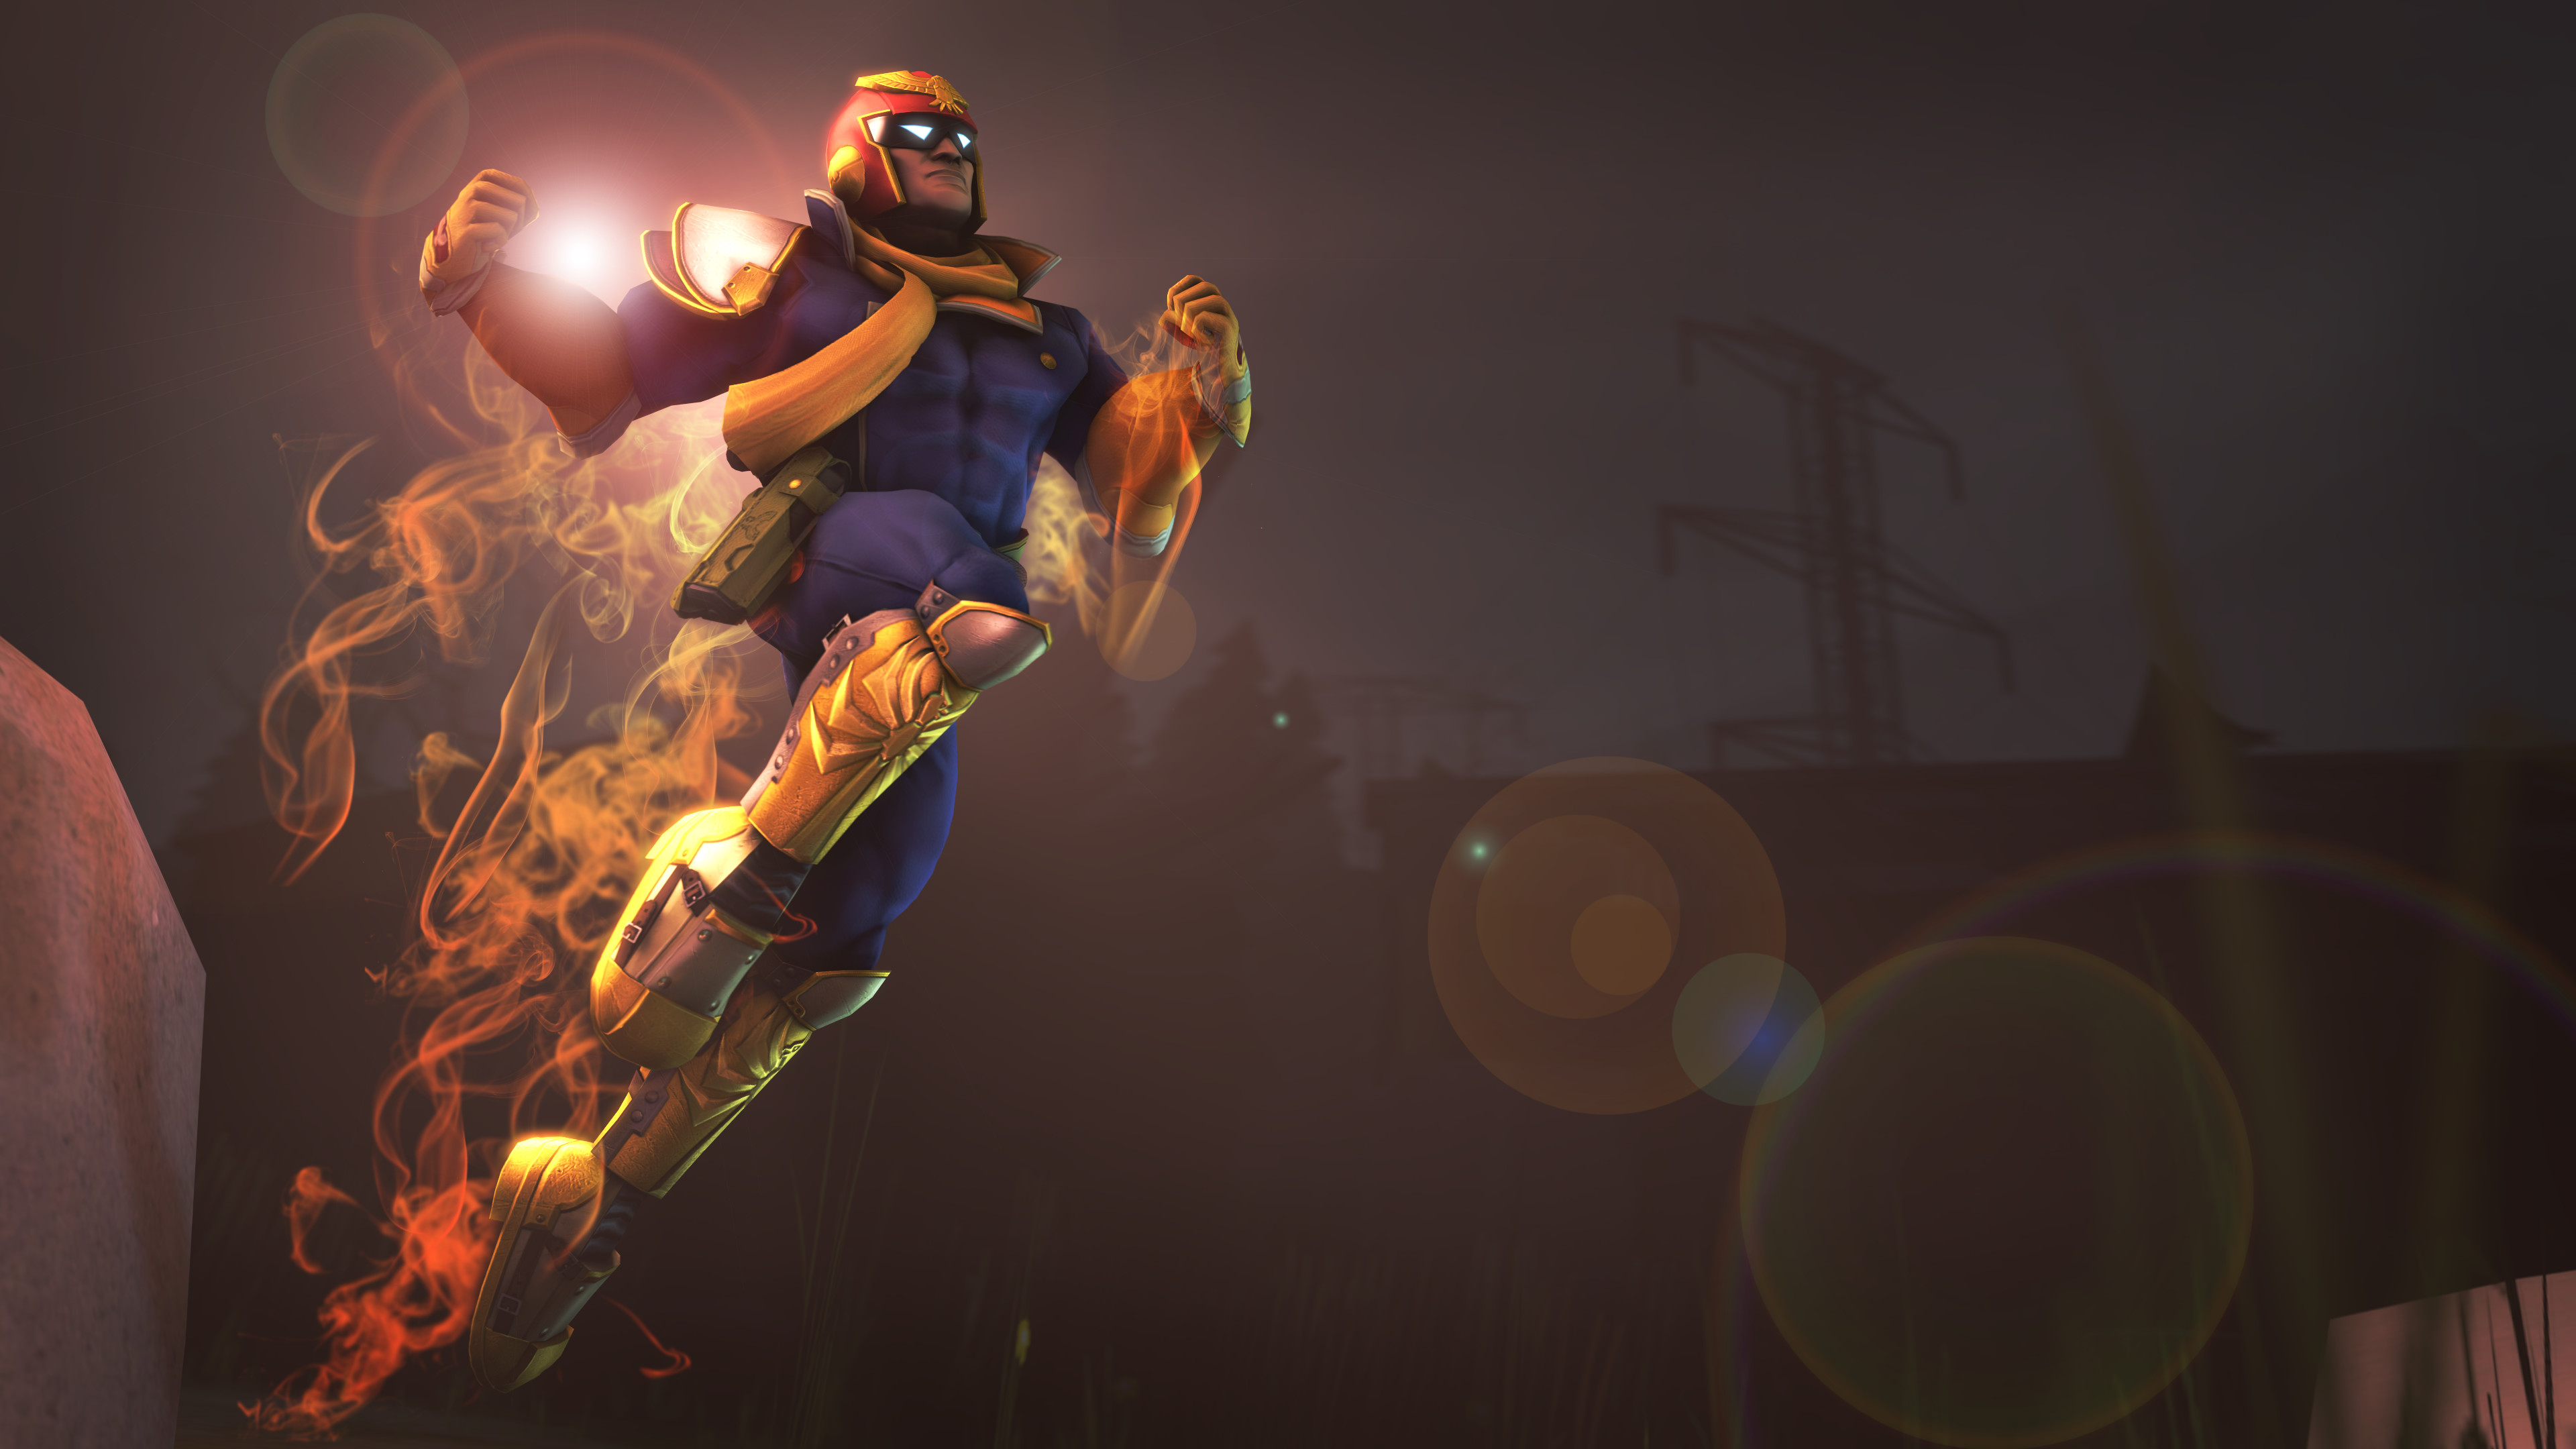 HQ render of Captain Falcon.